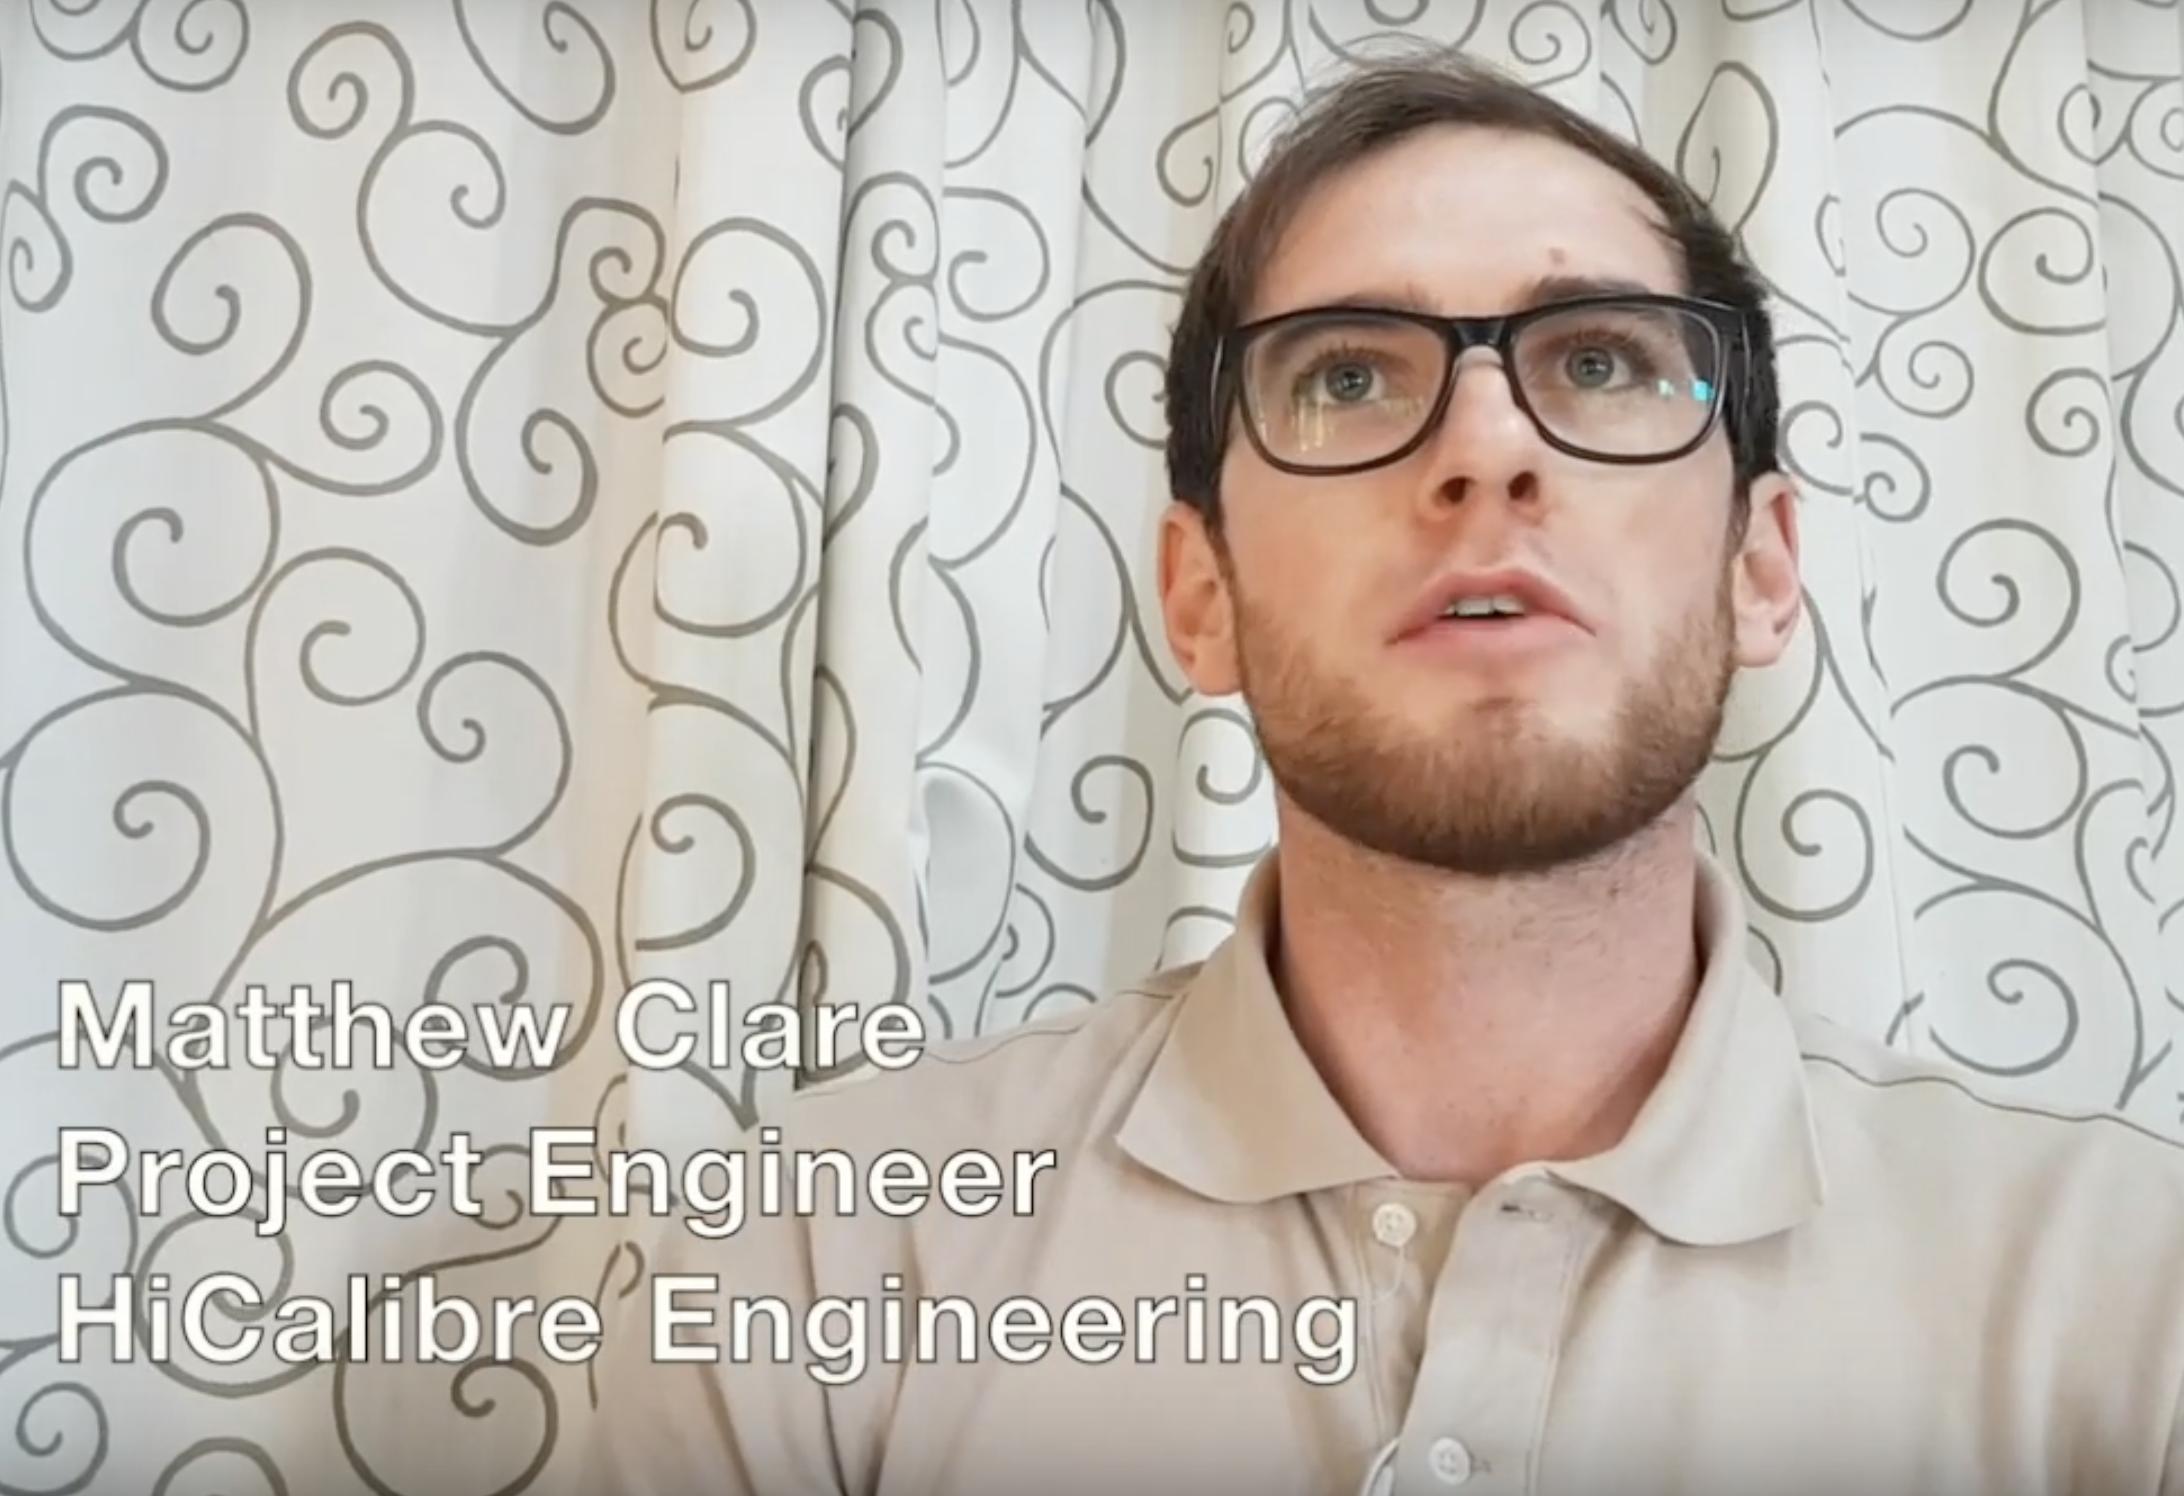 Hi Calibre Engineering